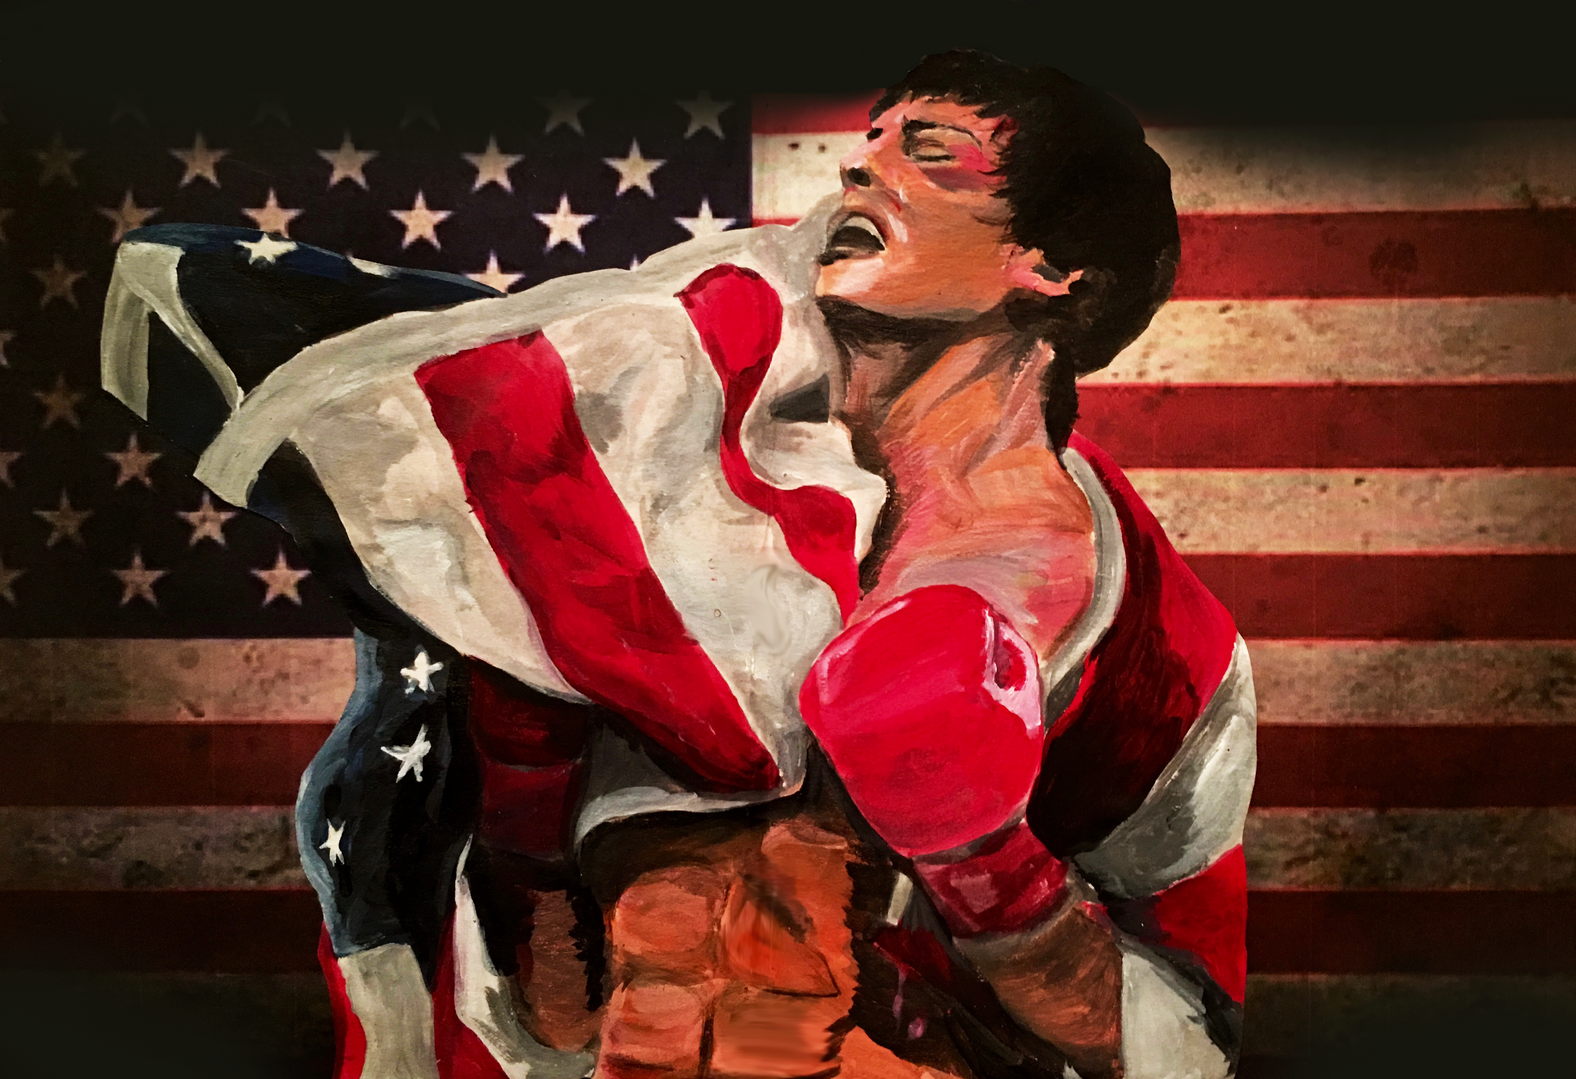 ROCKY'S VICTORY